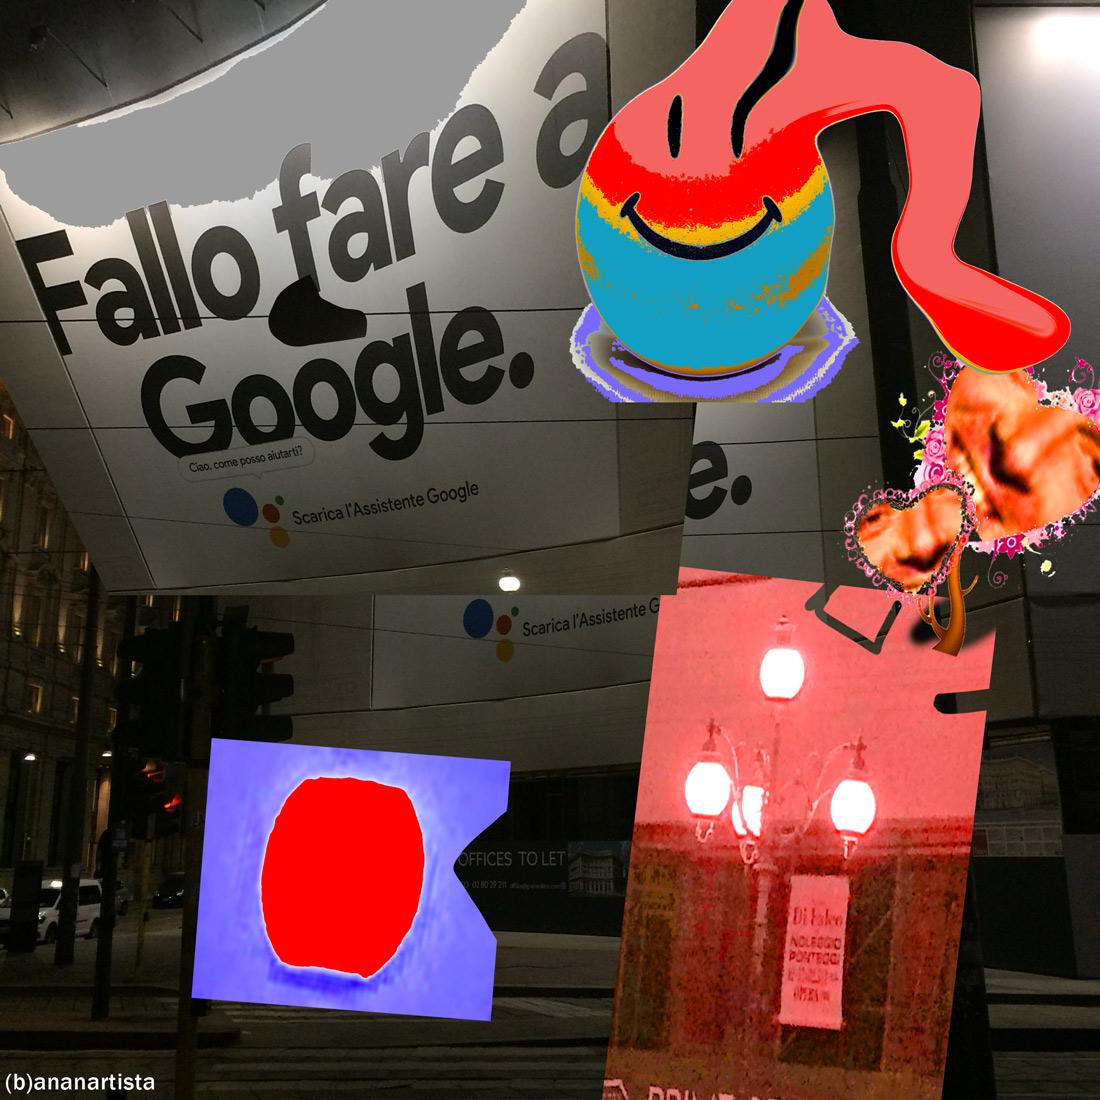 horrible art #04: fallo fare a google foto urbana di (b)ananartista sbuff